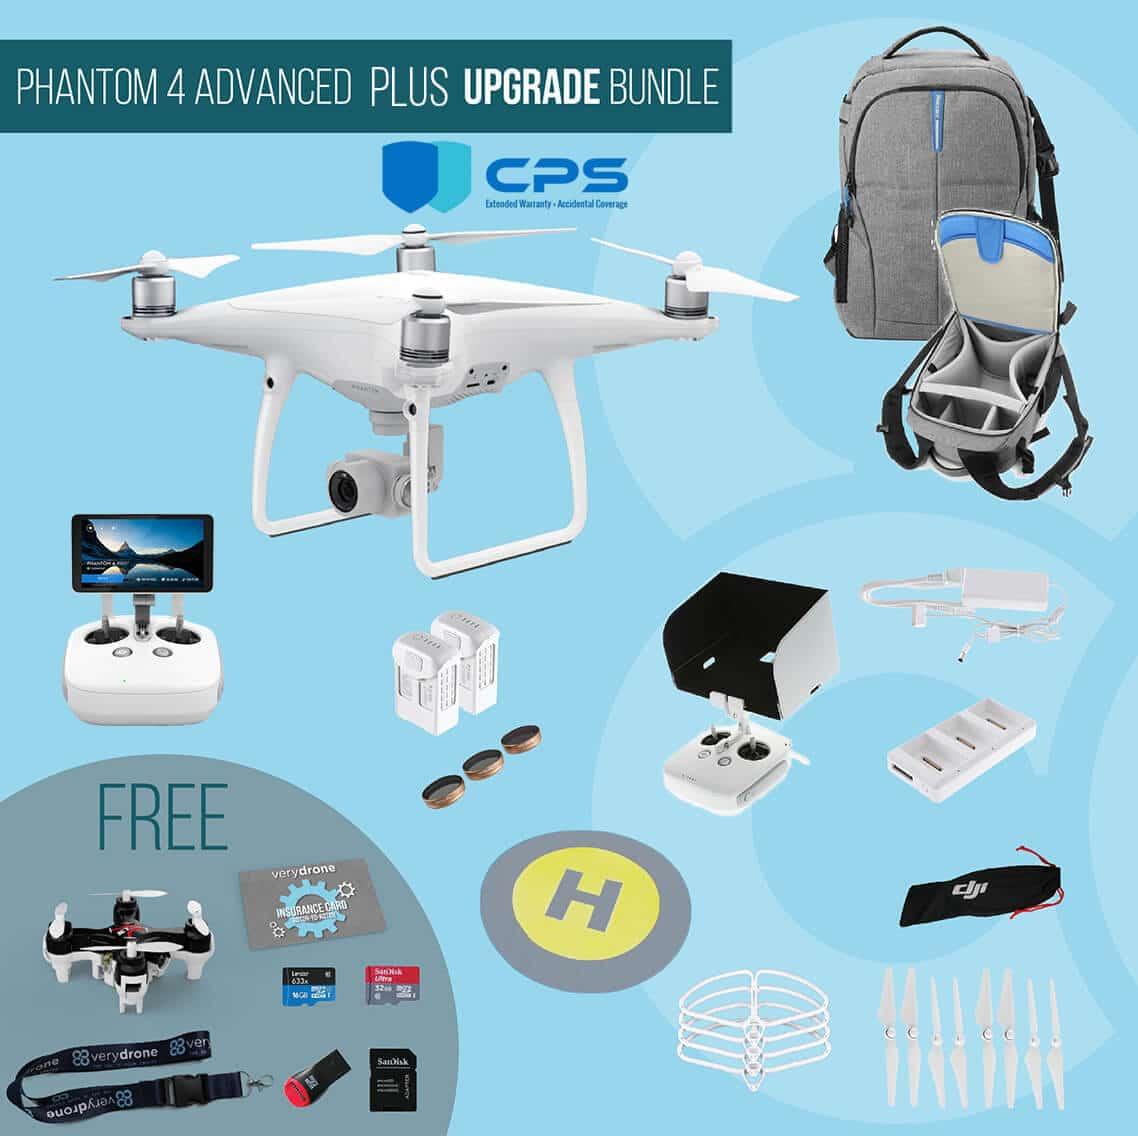 DJI Phantom 4 Advanced - Upgrade Bundle insured